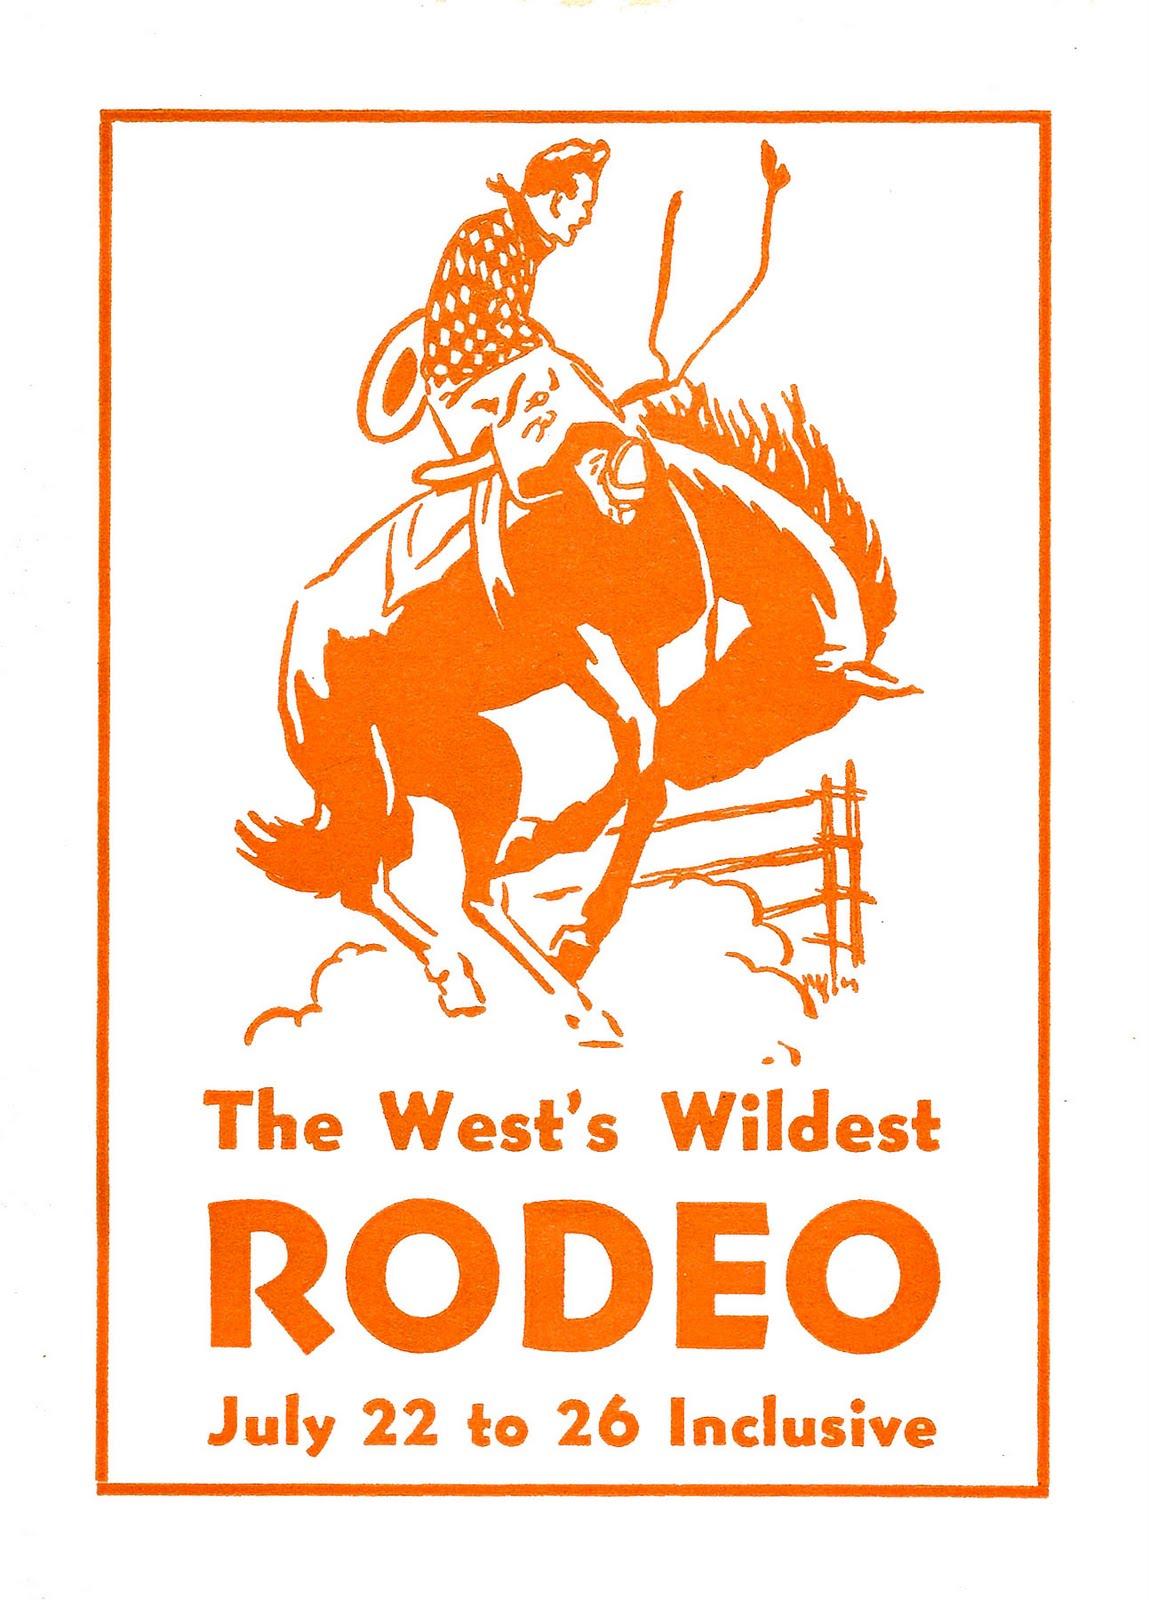 http://1.bp.blogspot.com/_CarNcodpCMA/TTeX6gQBYkI/AAAAAAAAKgw/y2H6xWrRbdw/s1600/rodeo-graphicsfairy002blgow.jpg